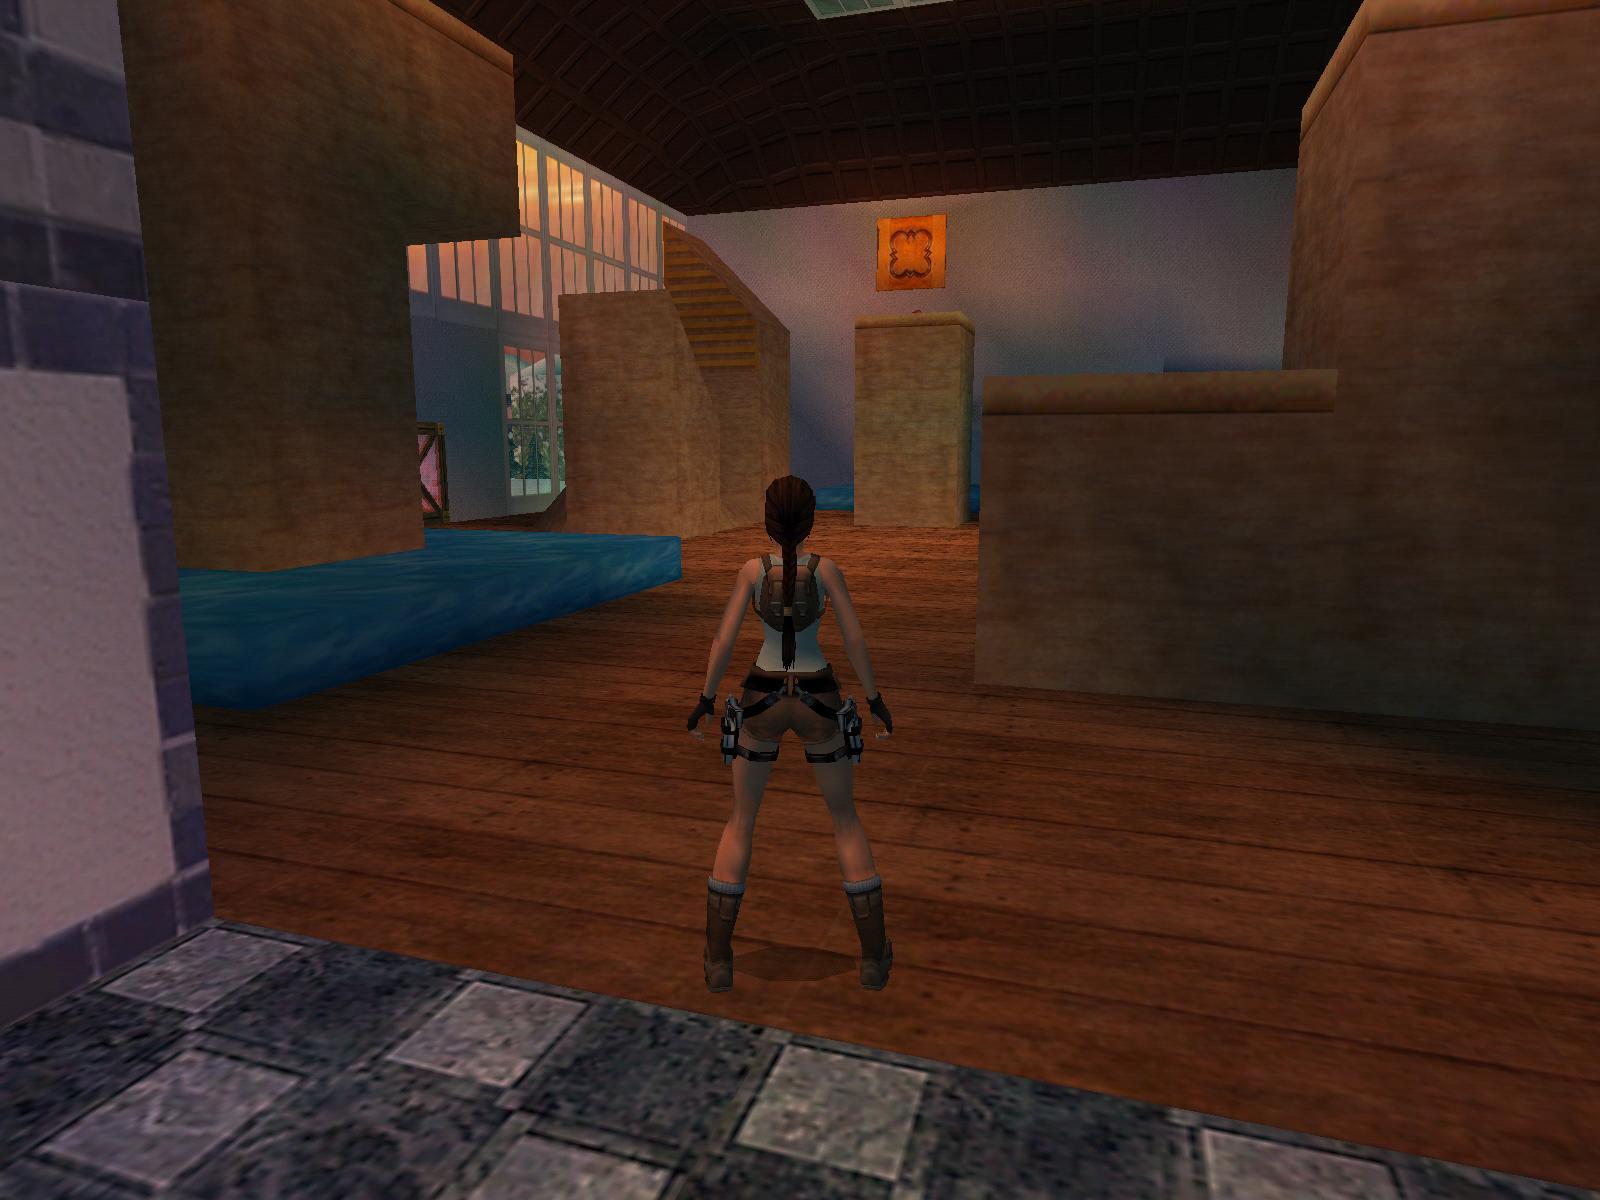 Lara Croft  Secret Room In House